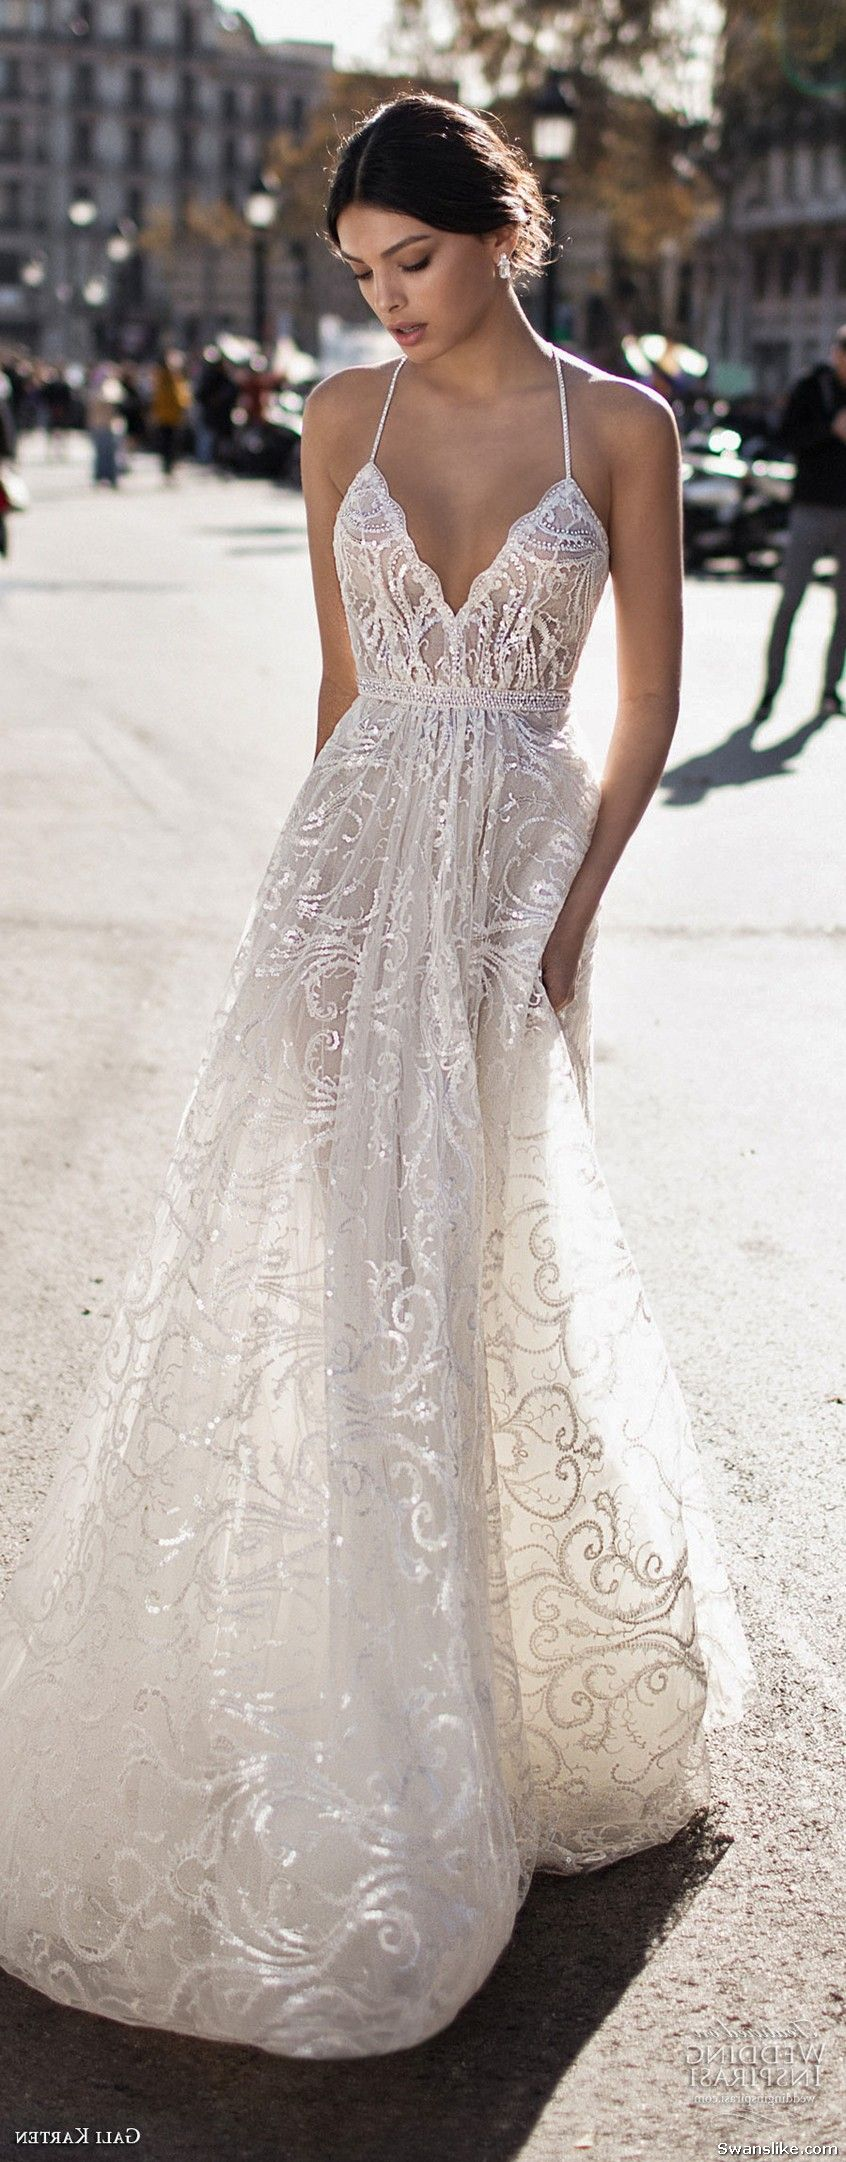 Trendy wedding dresses  Wedding Weddings Weddingdress Fashion Wedding Dresses  Cheap